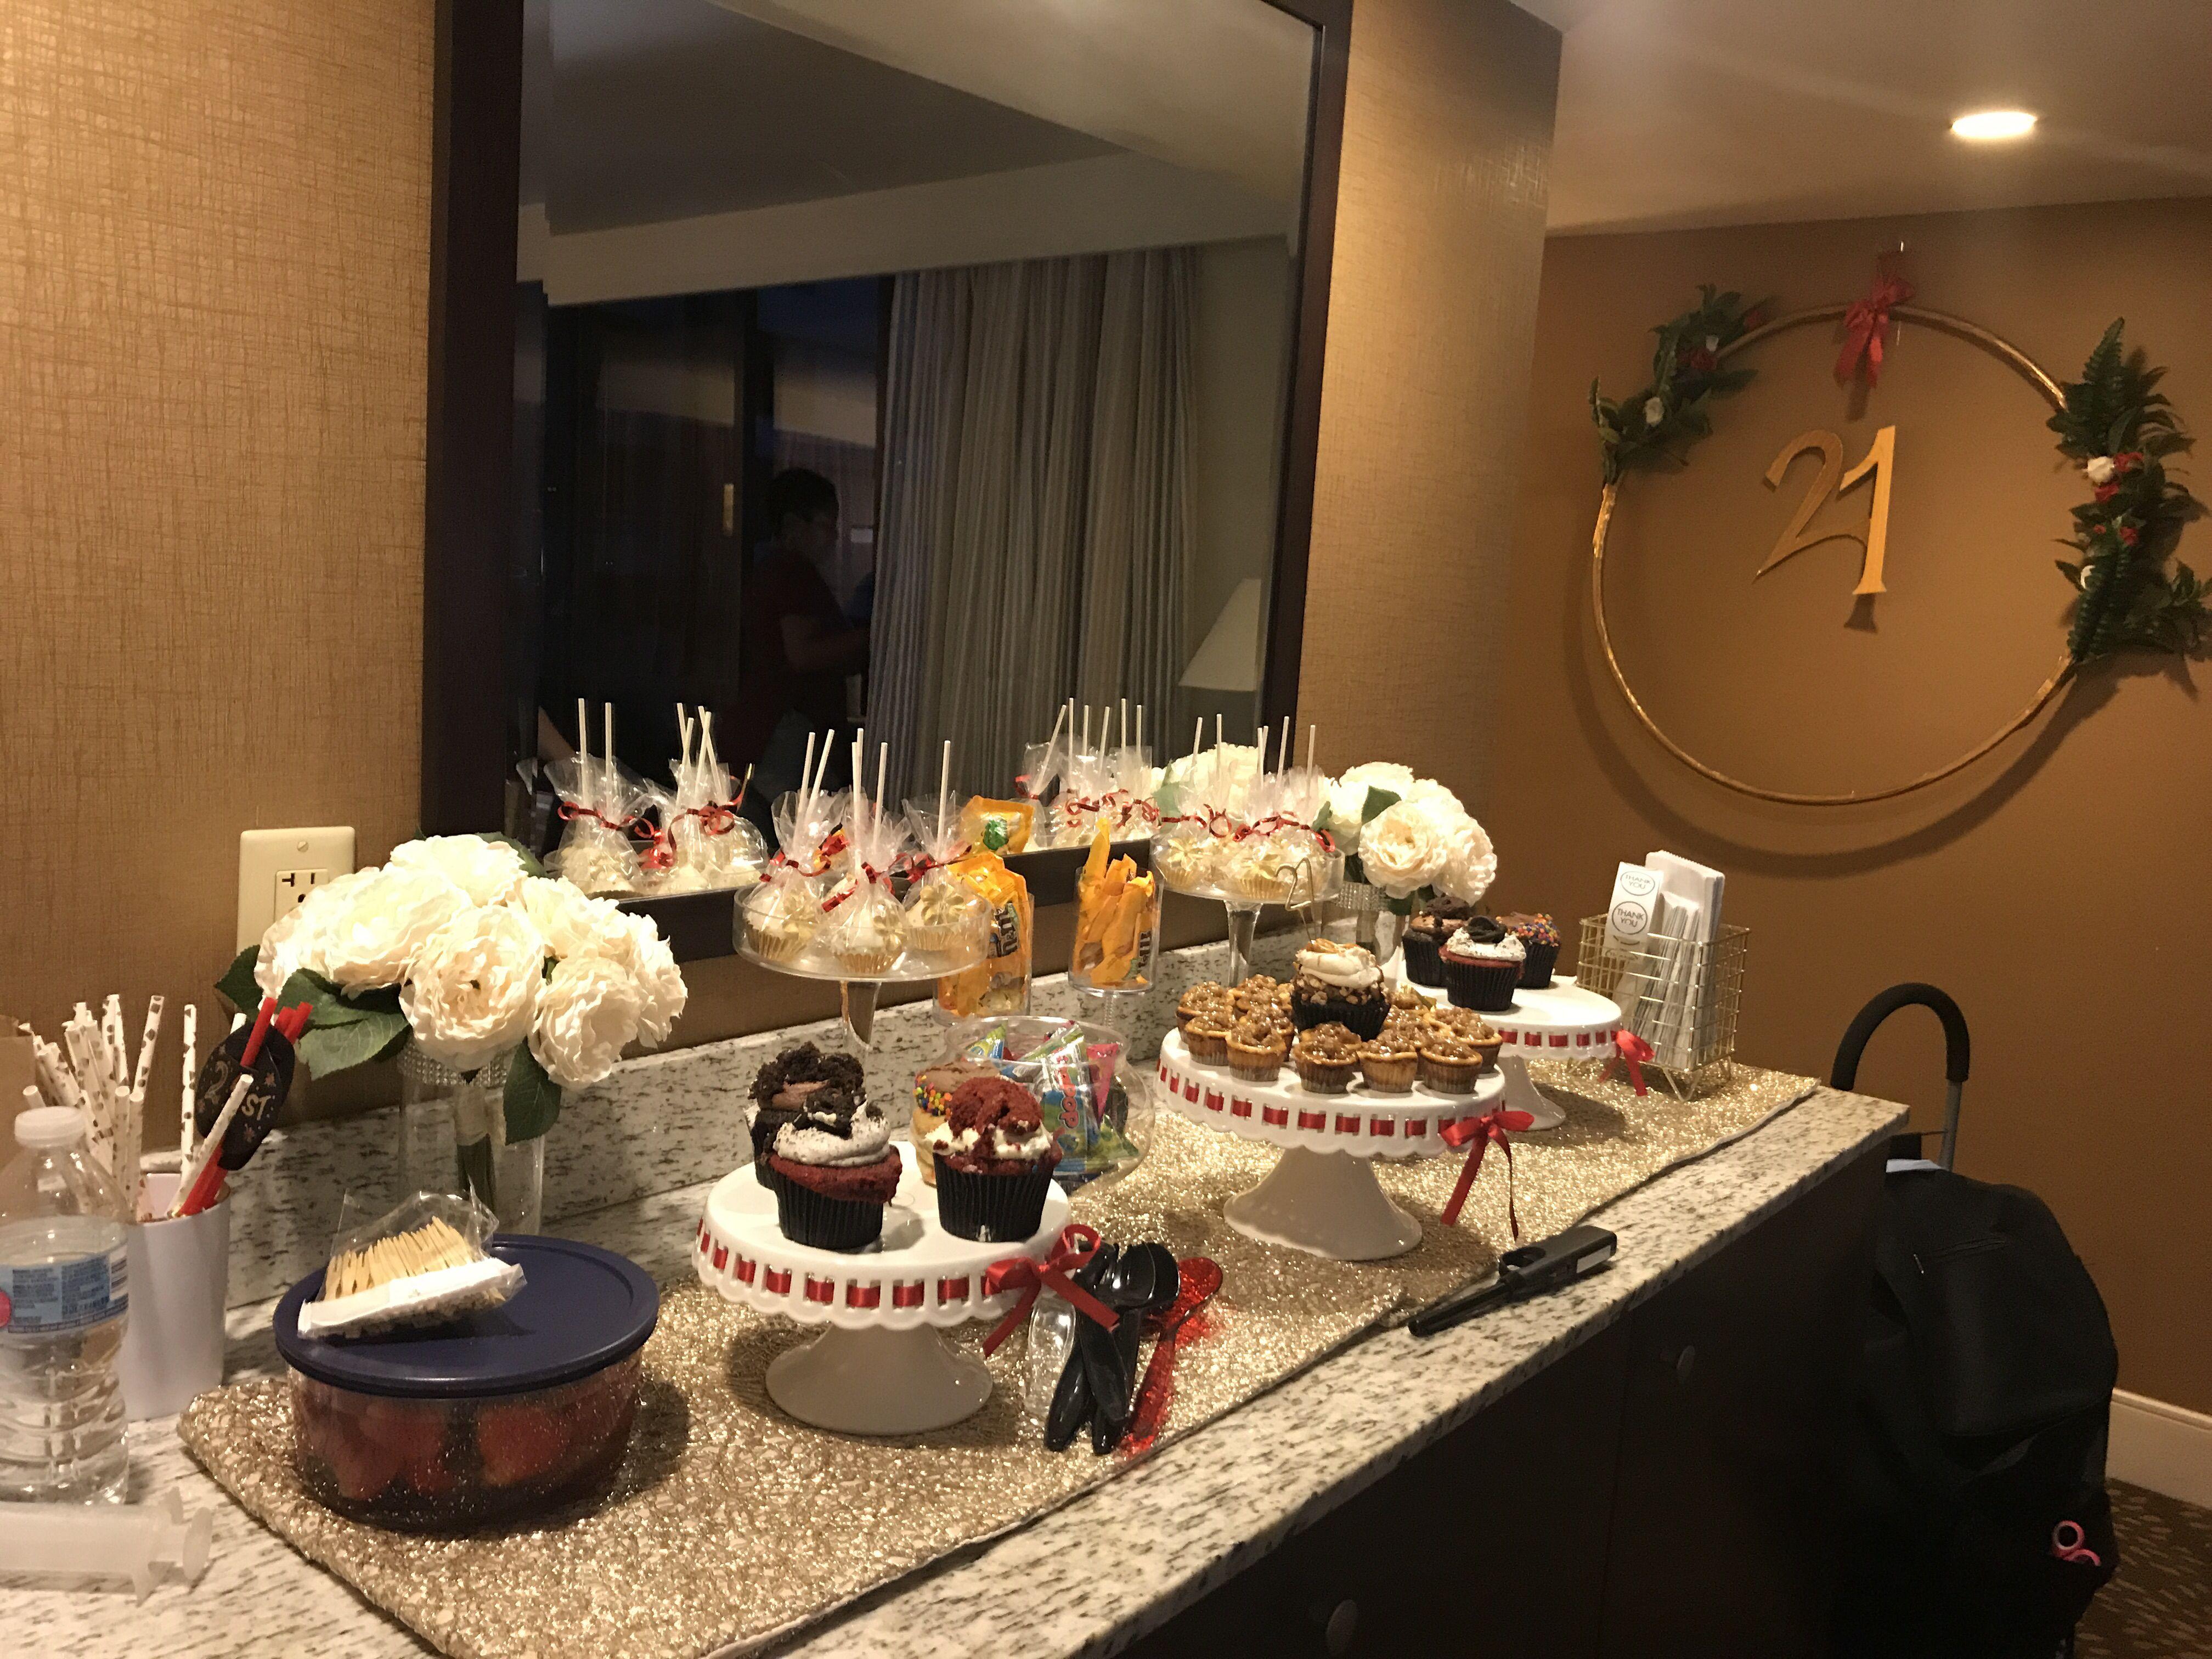 21st Birthday Celebration Small Desserts Dessert Table Hotel Party